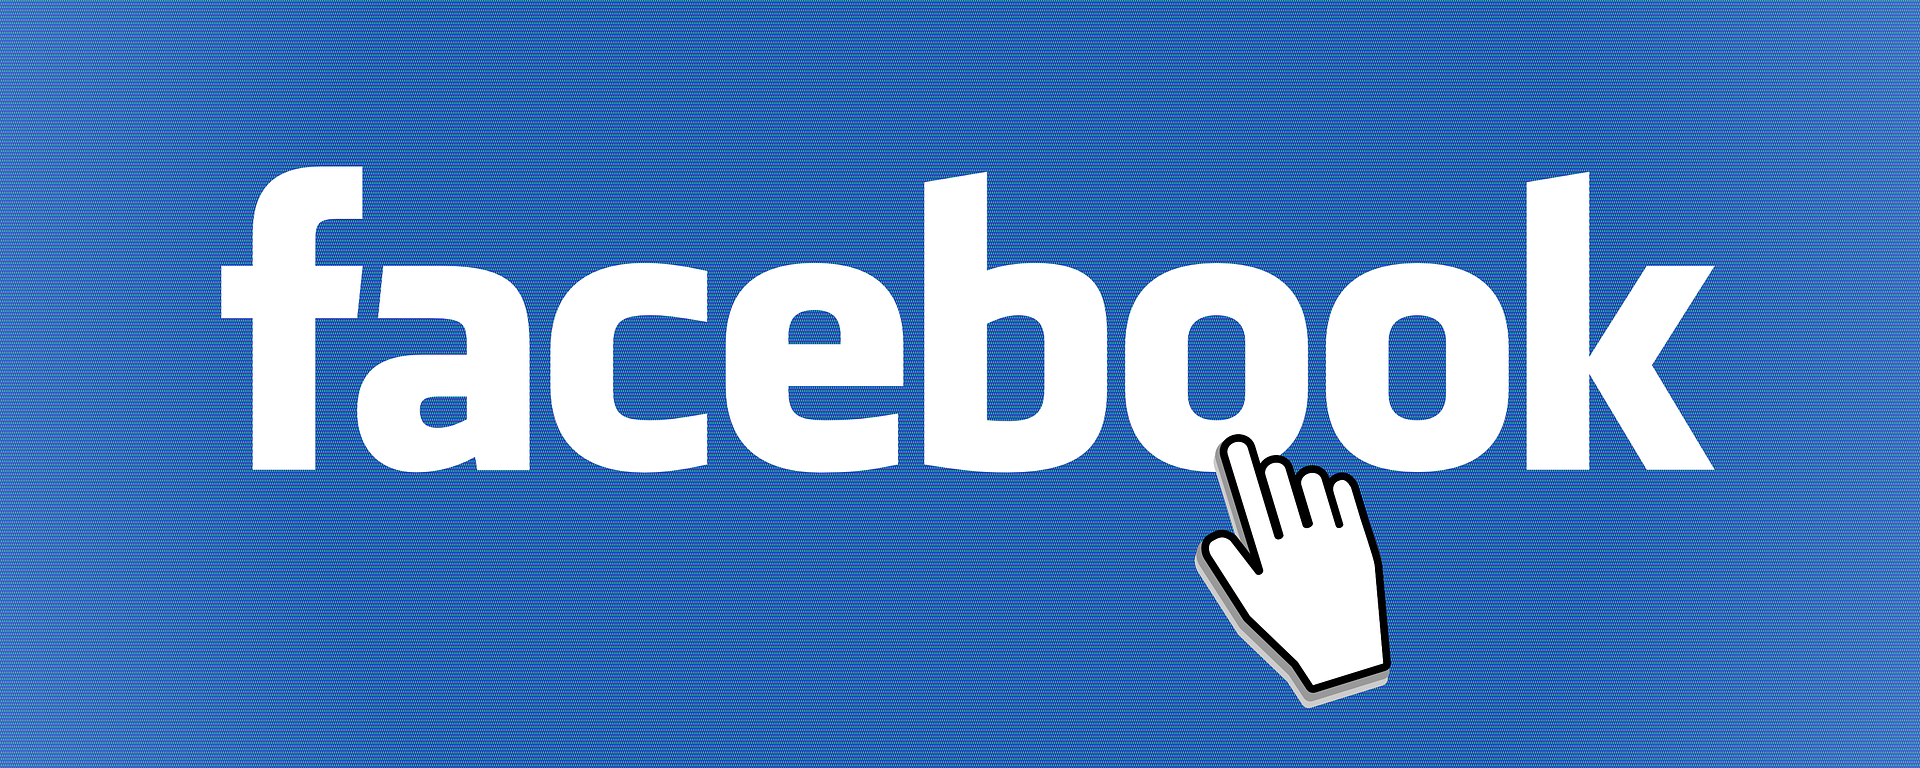 Logo de Facebook - Sputnik Mundo, 1920, 05.10.2021